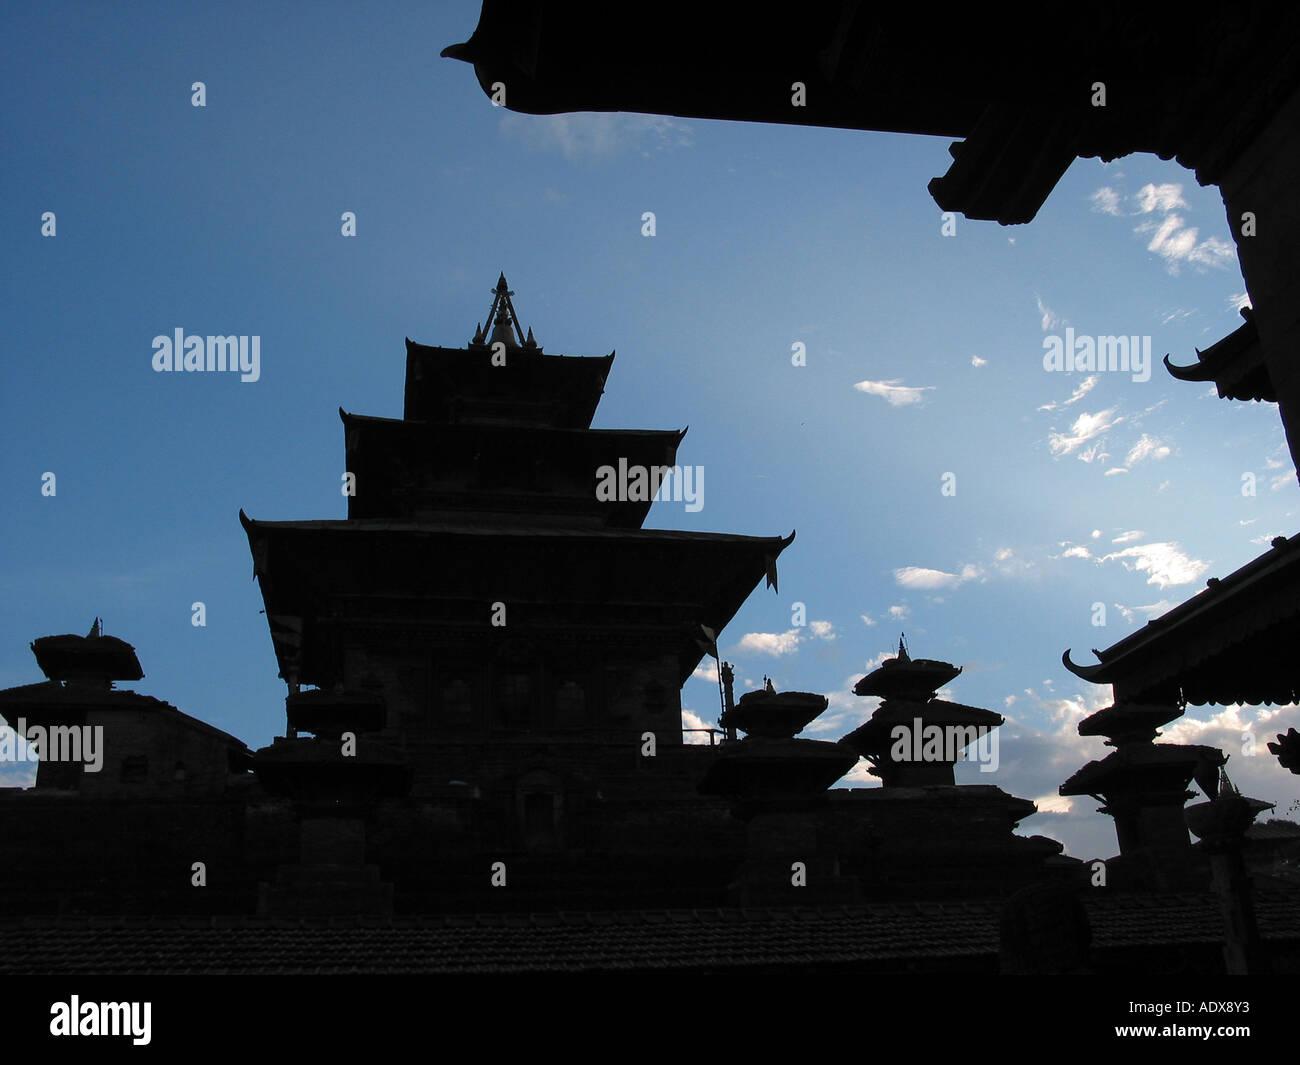 Old Durbar and Basantapur square Katmandu - Stock Image